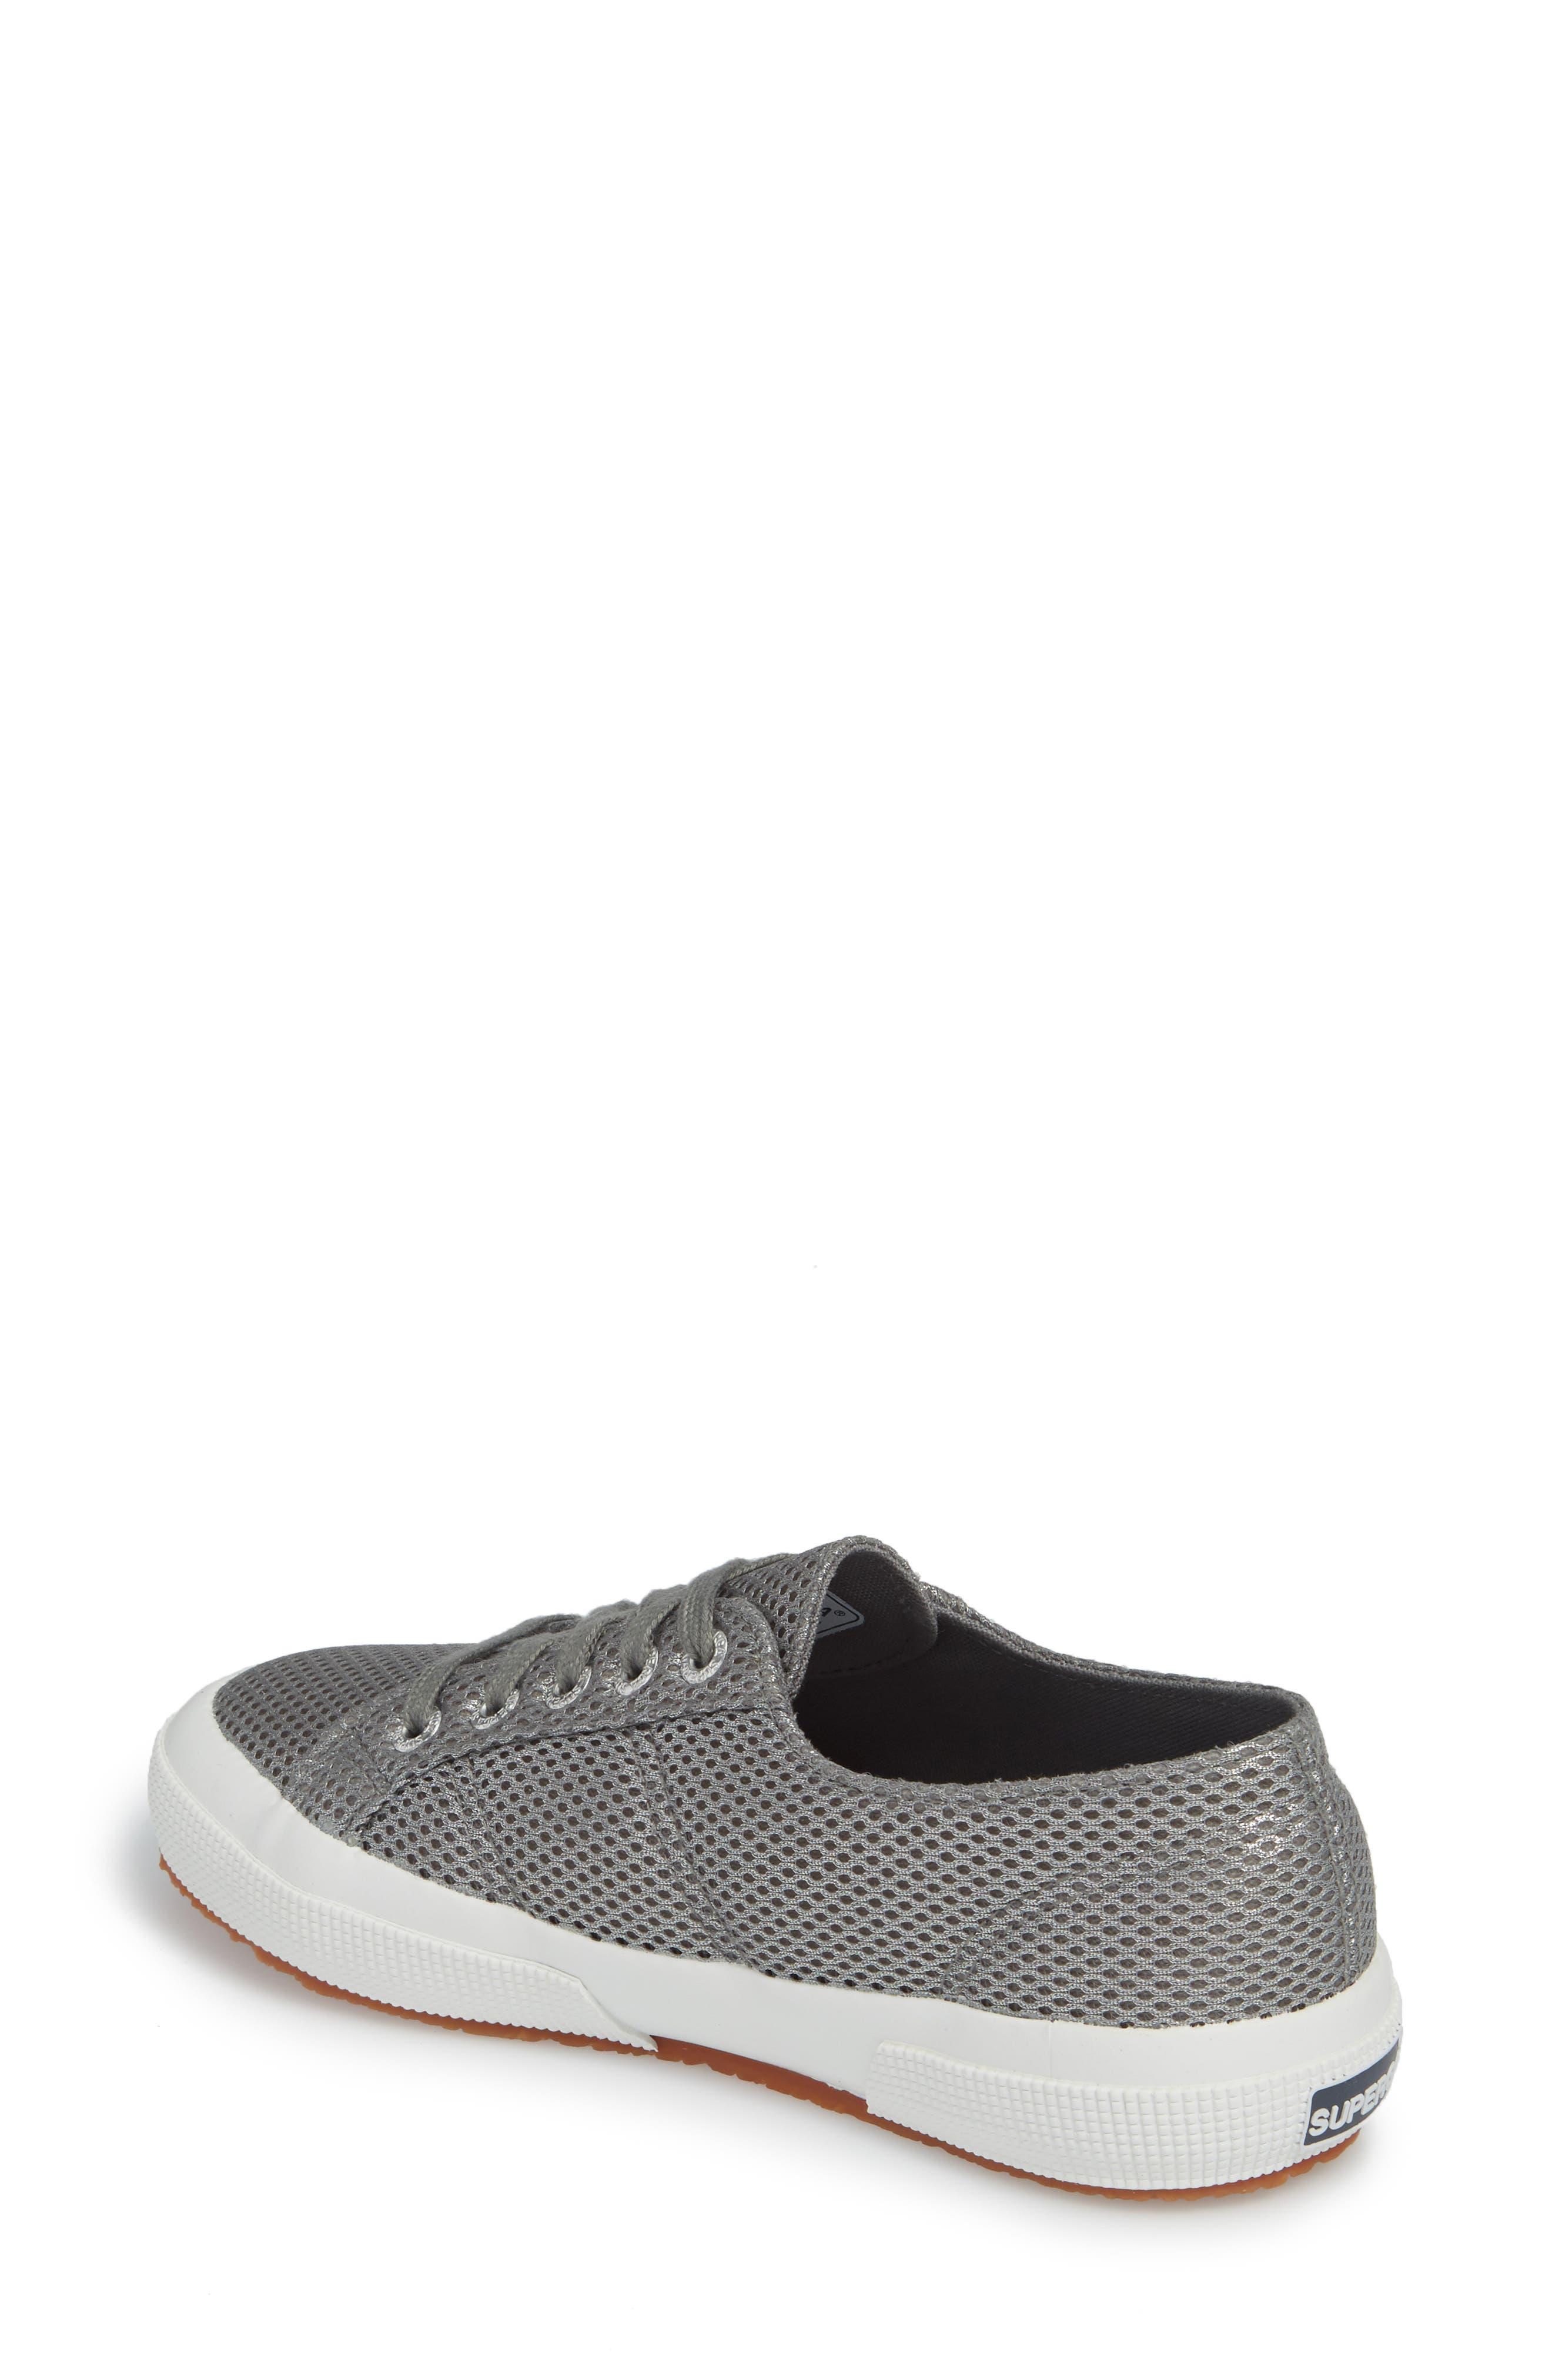 2750 Metallic Sneaker,                             Alternate thumbnail 2, color,                             044